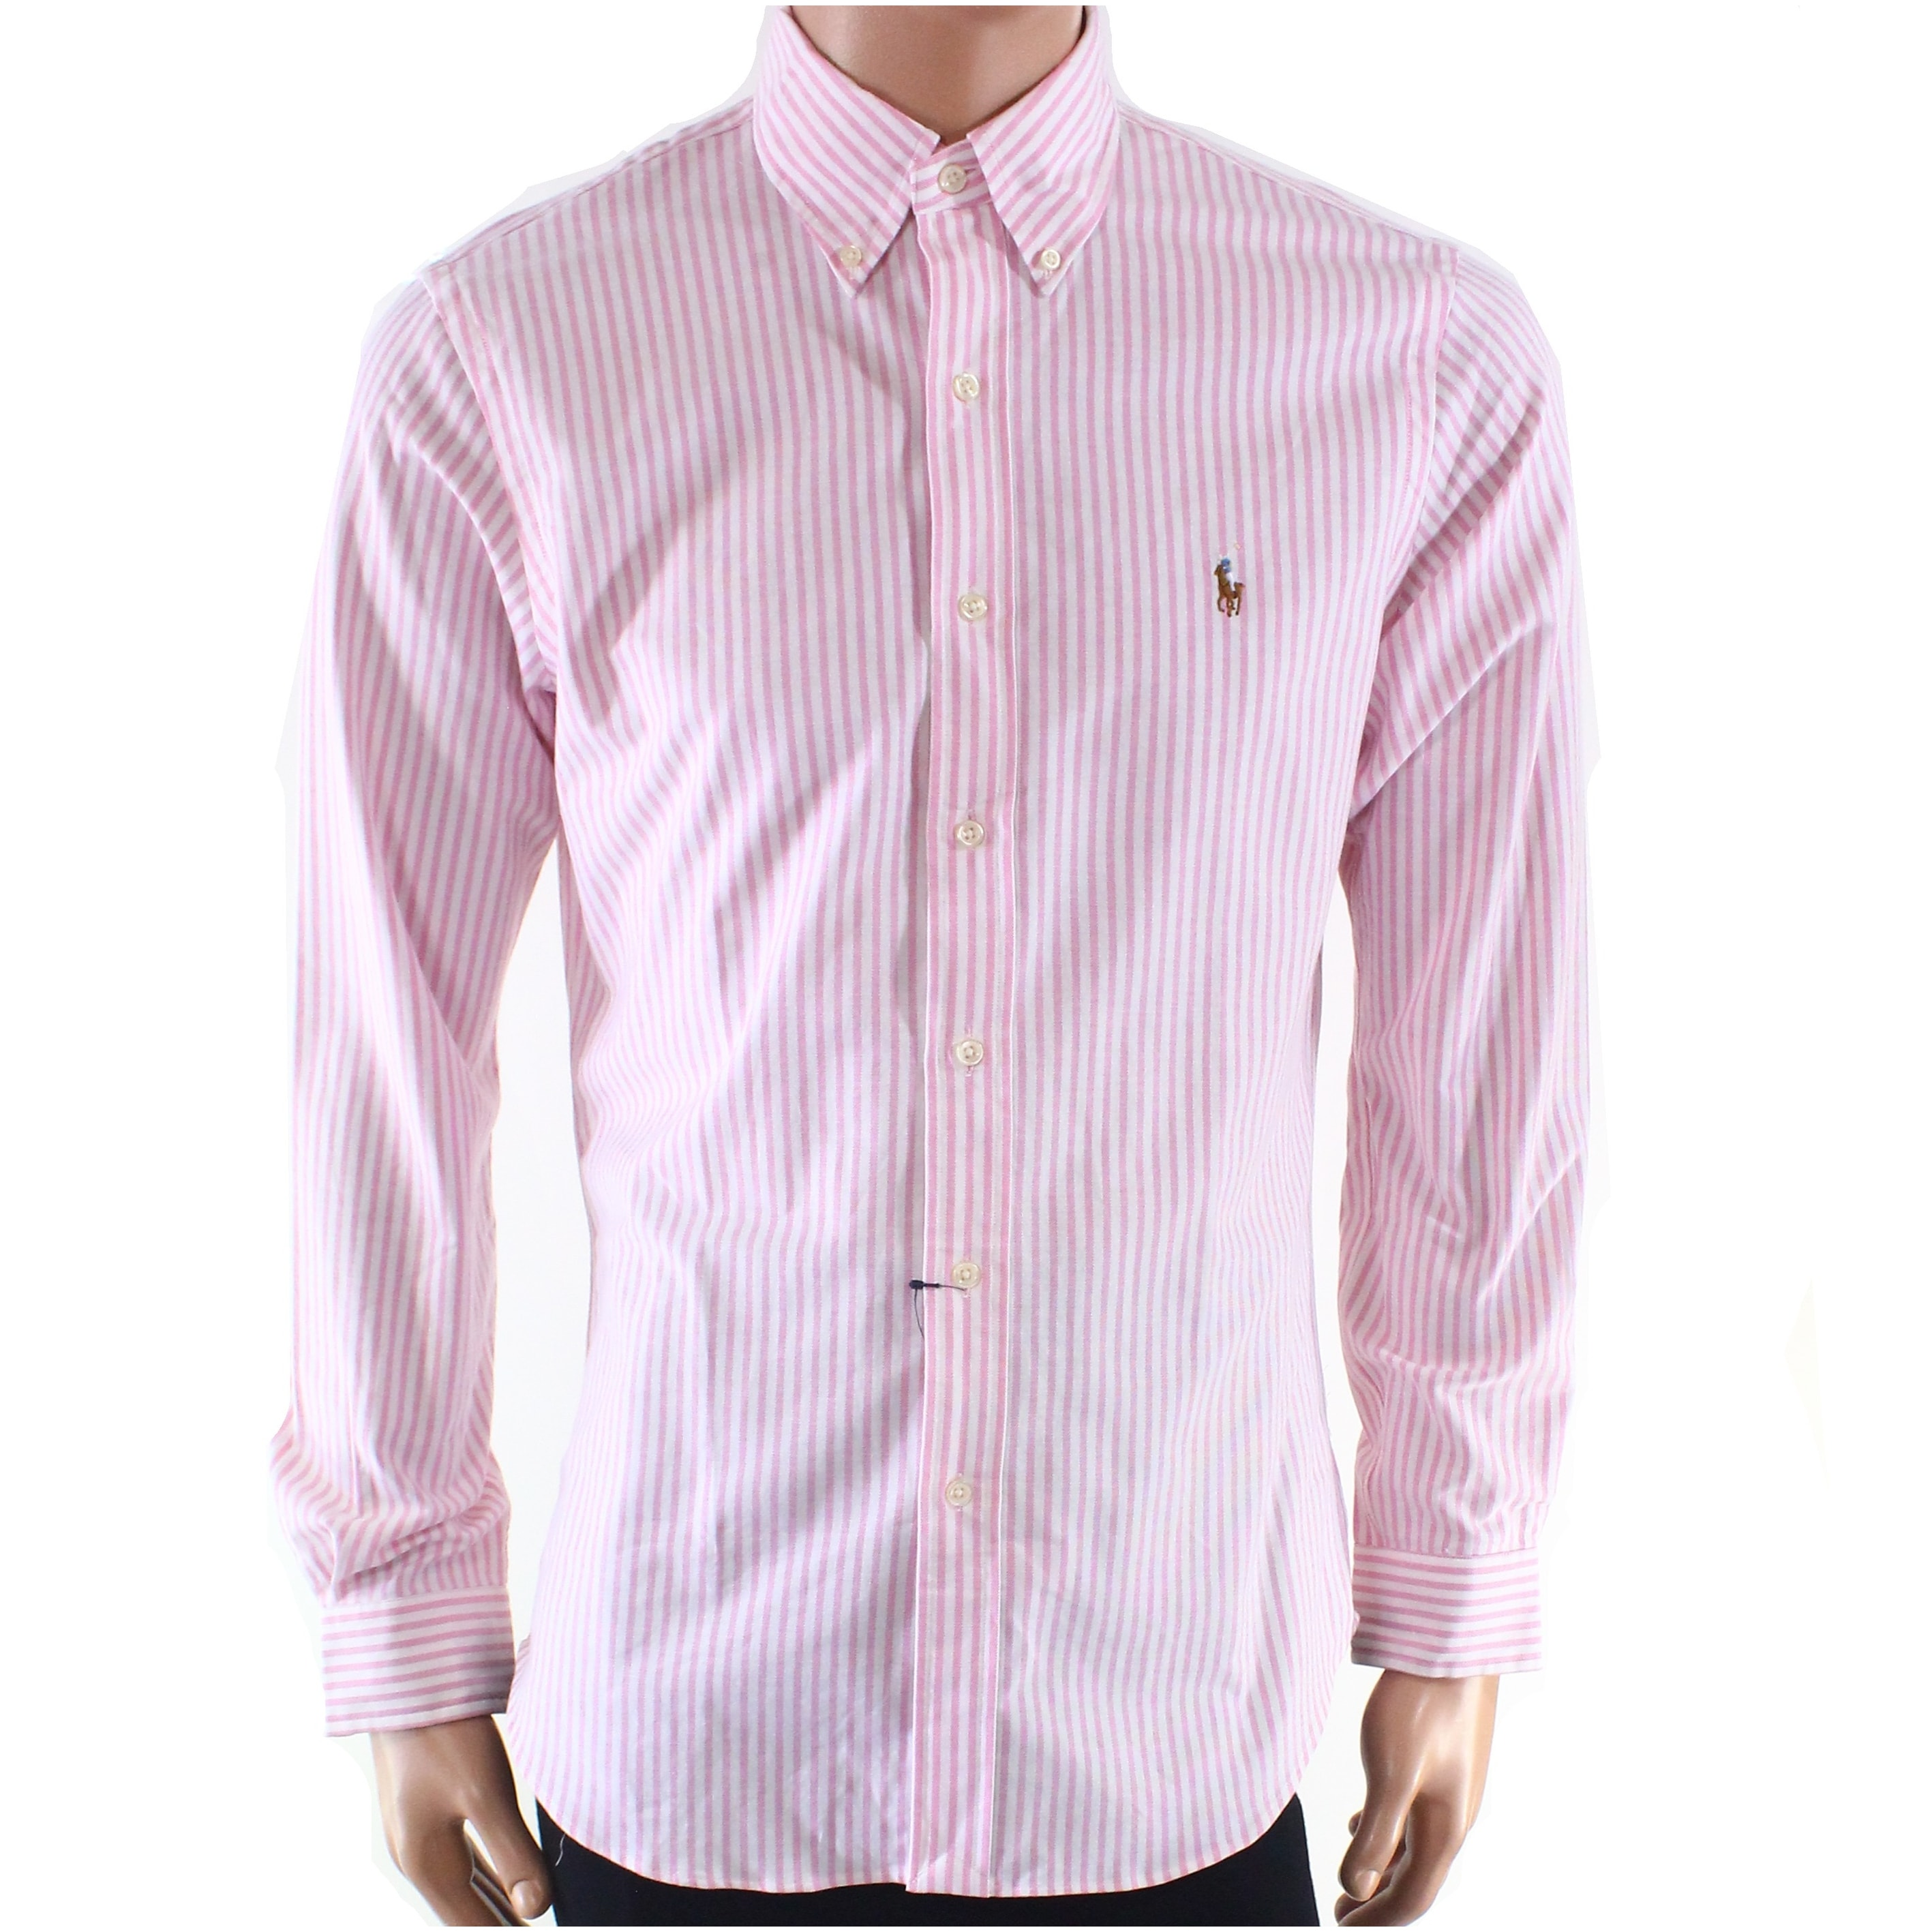 046e50910 Ralph Lauren Men s Clothing